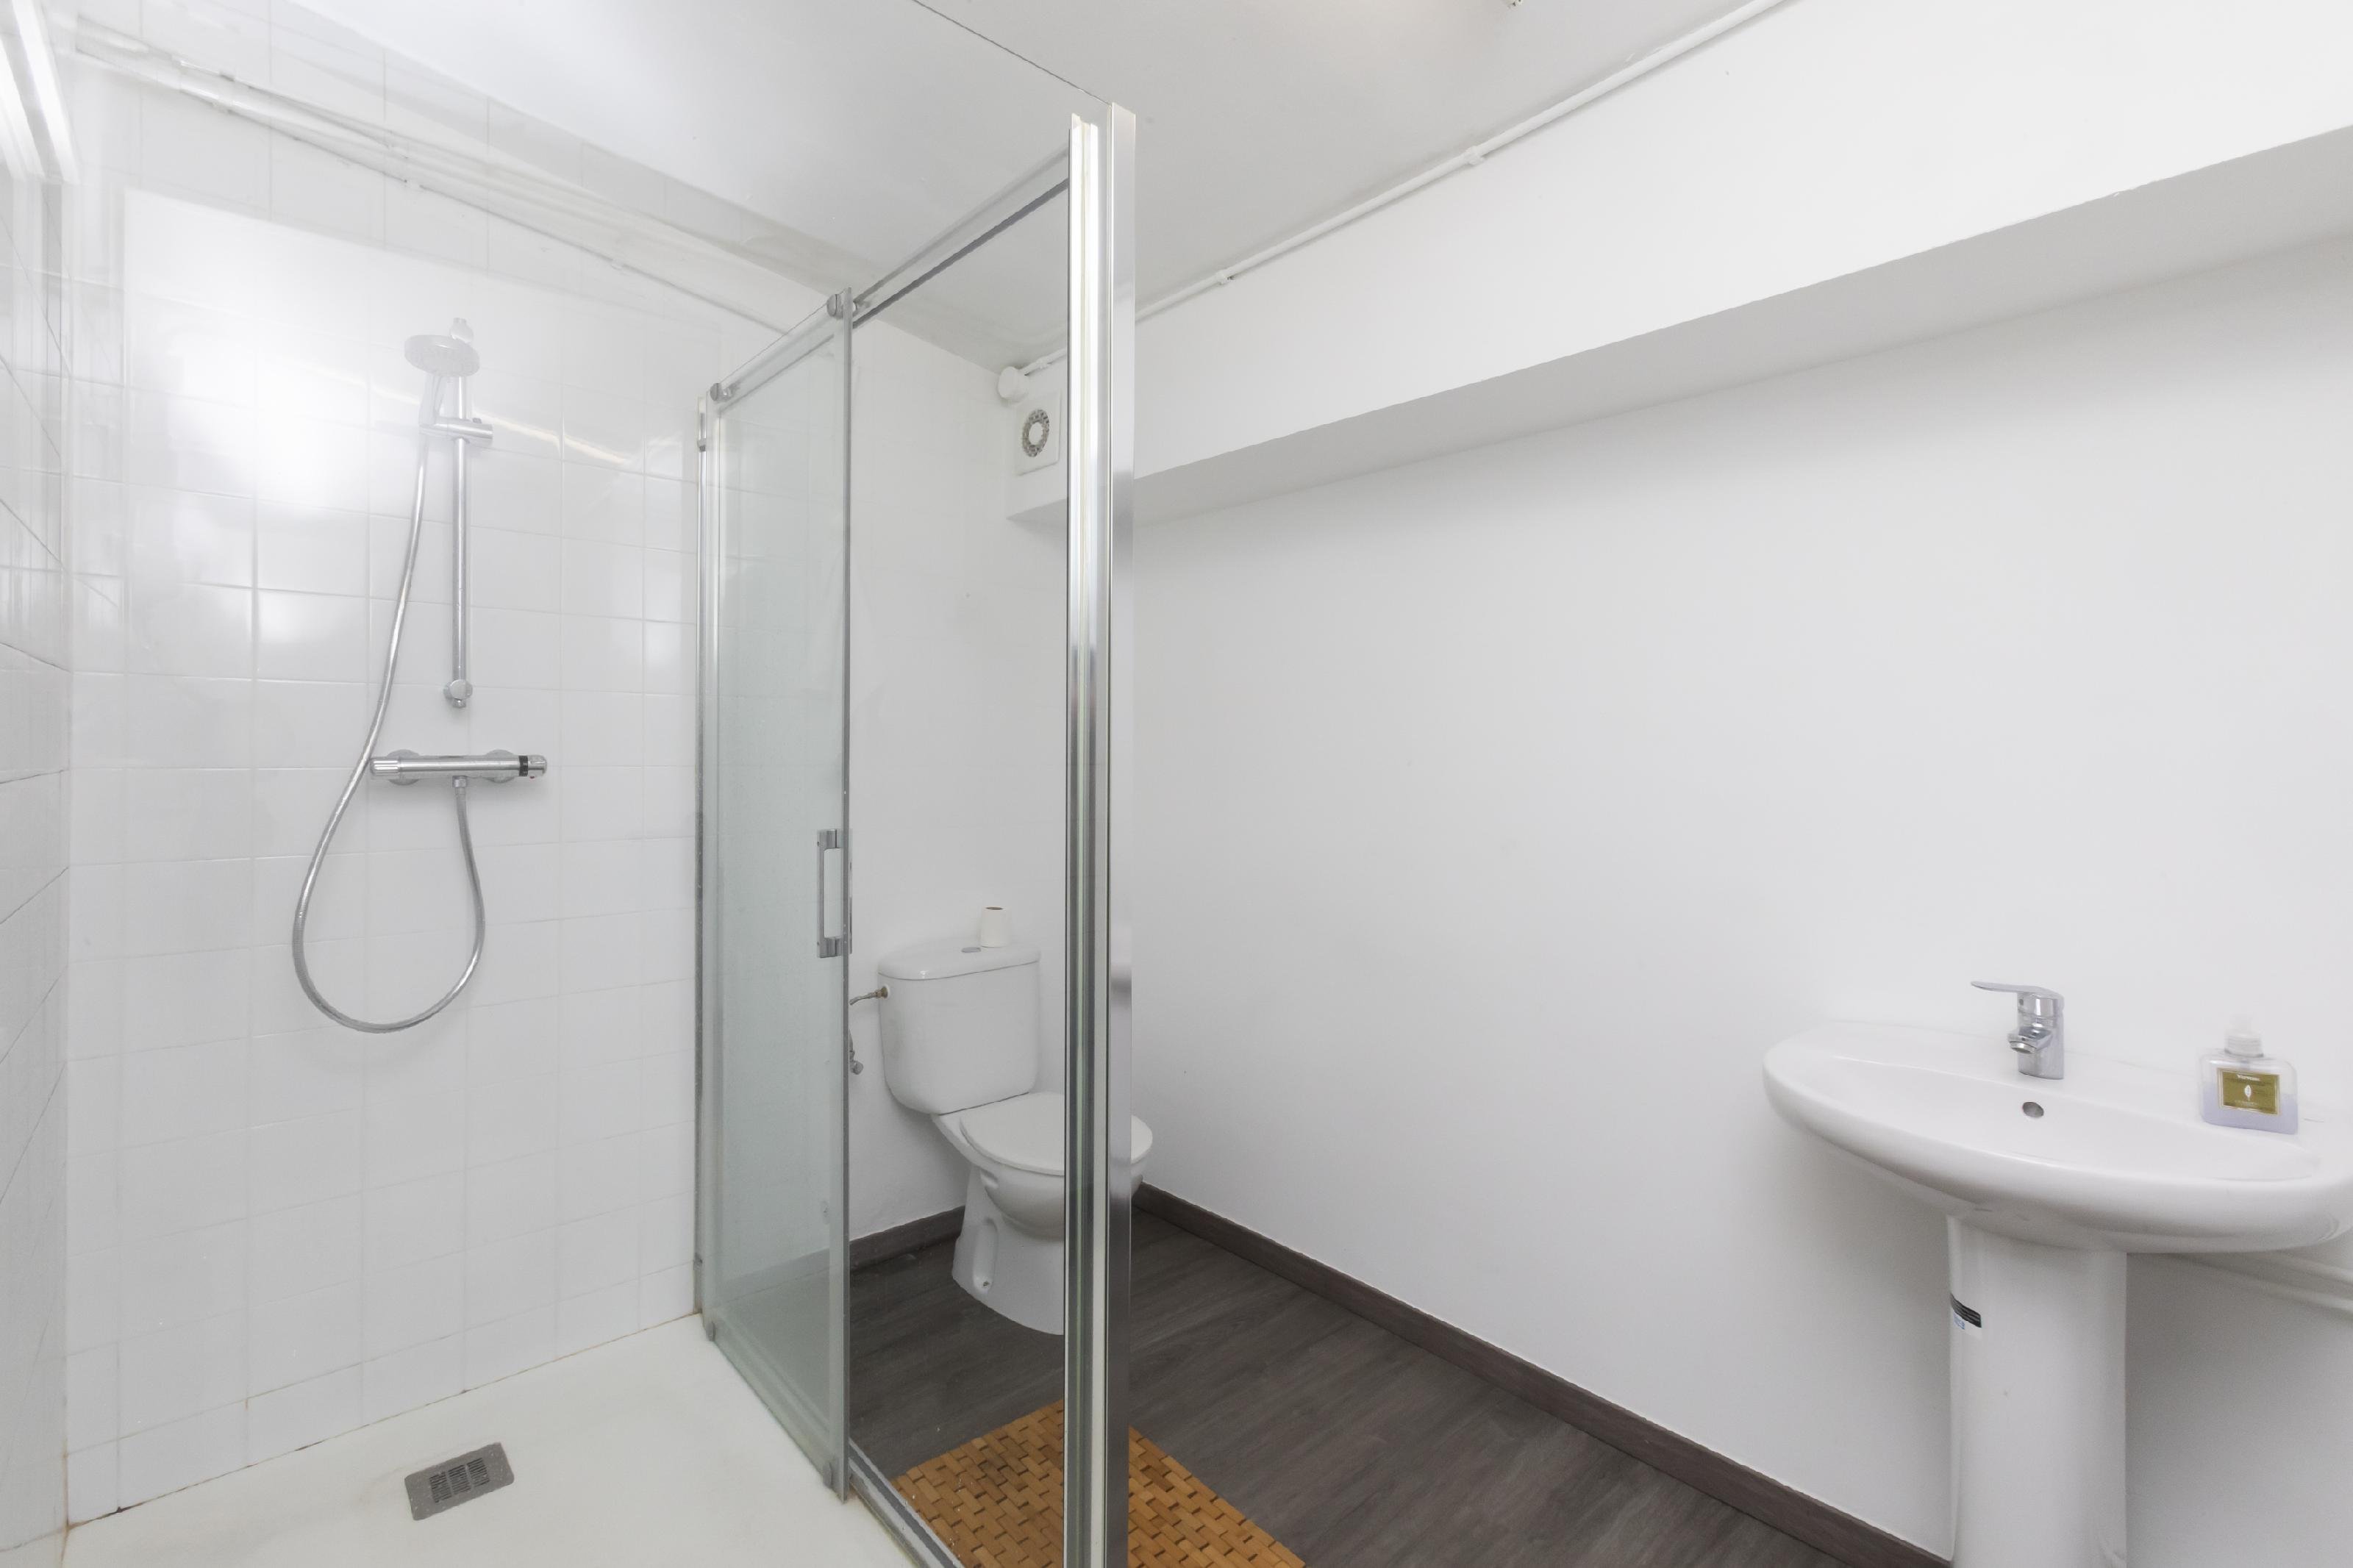 249493 Commercial premises for sale in Sarrià-Sant Gervasi, Sant Gervasi-Galvany 18